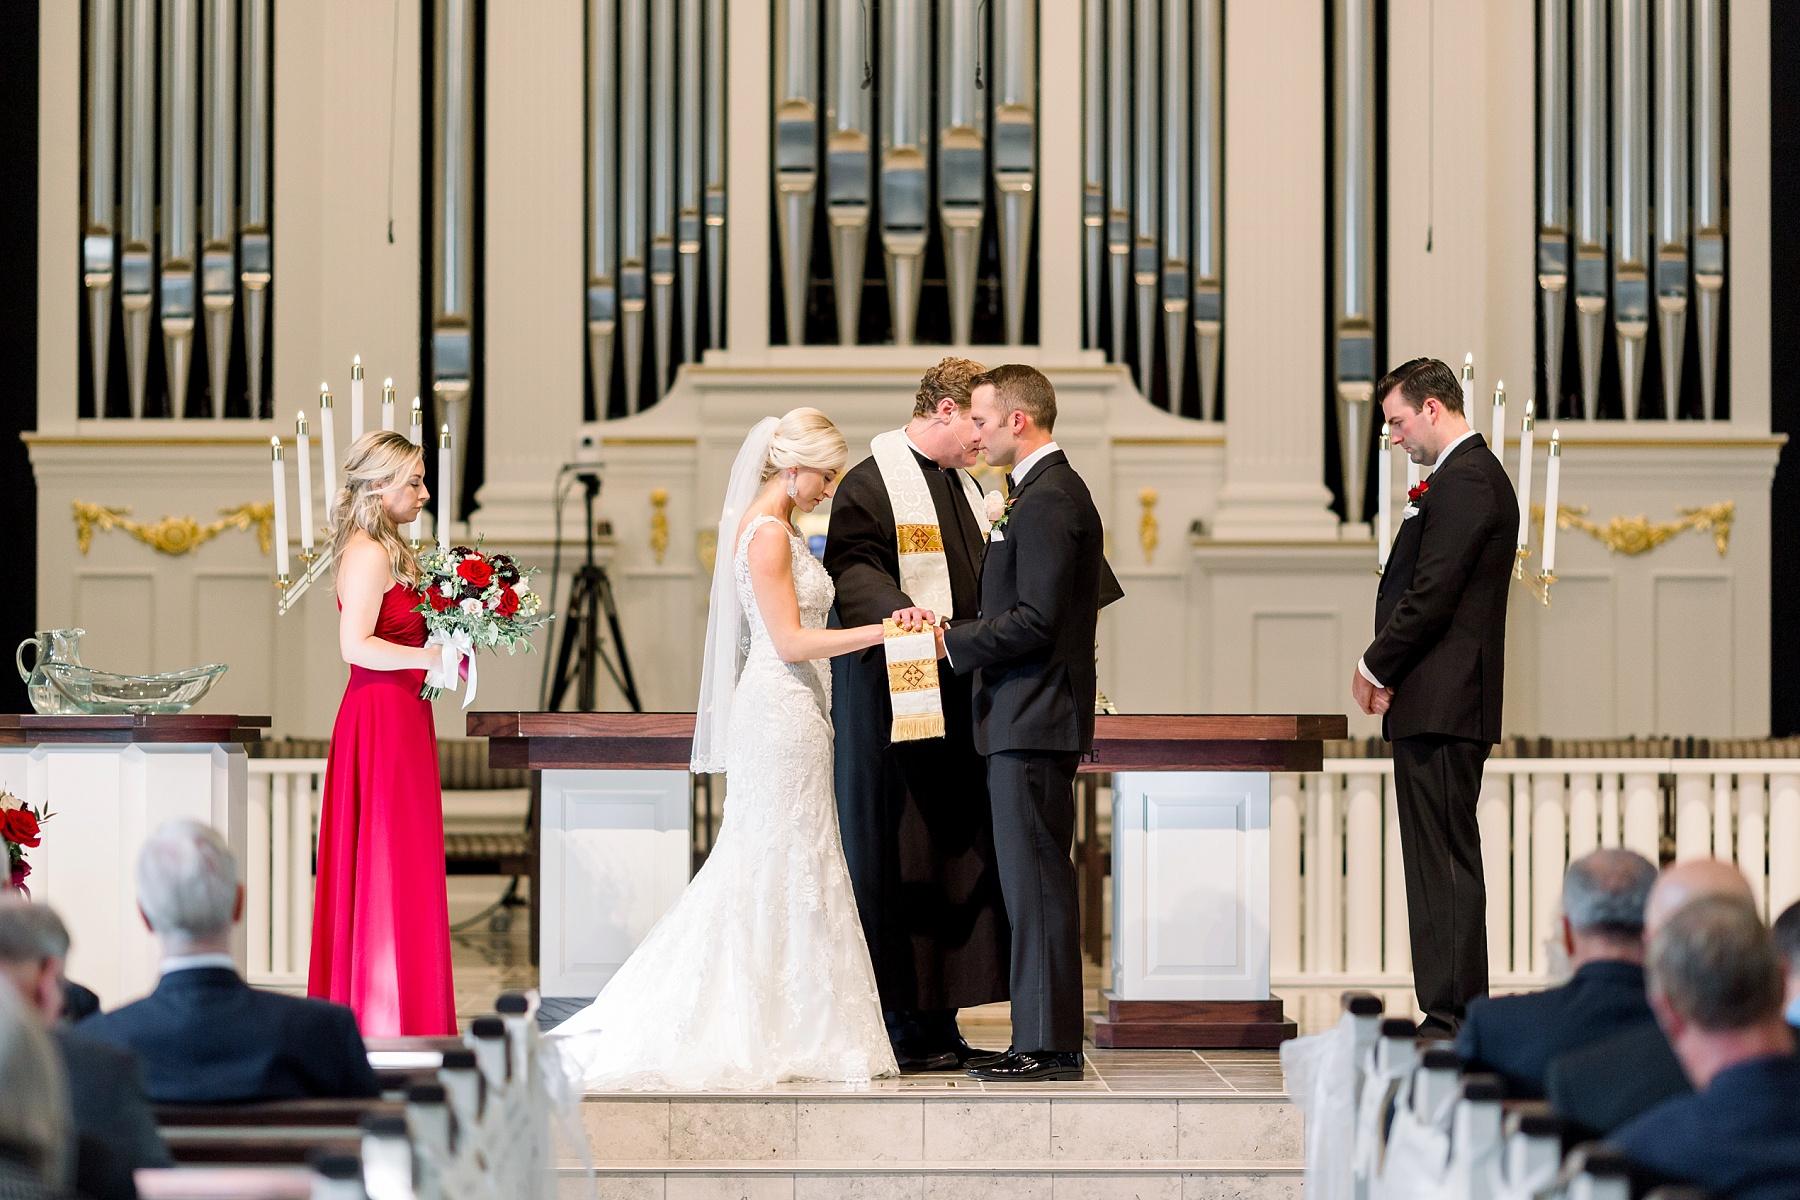 midwest-adventurous-wedding-photographer-elizabeth-ladean-photography-photo_4778.jpg